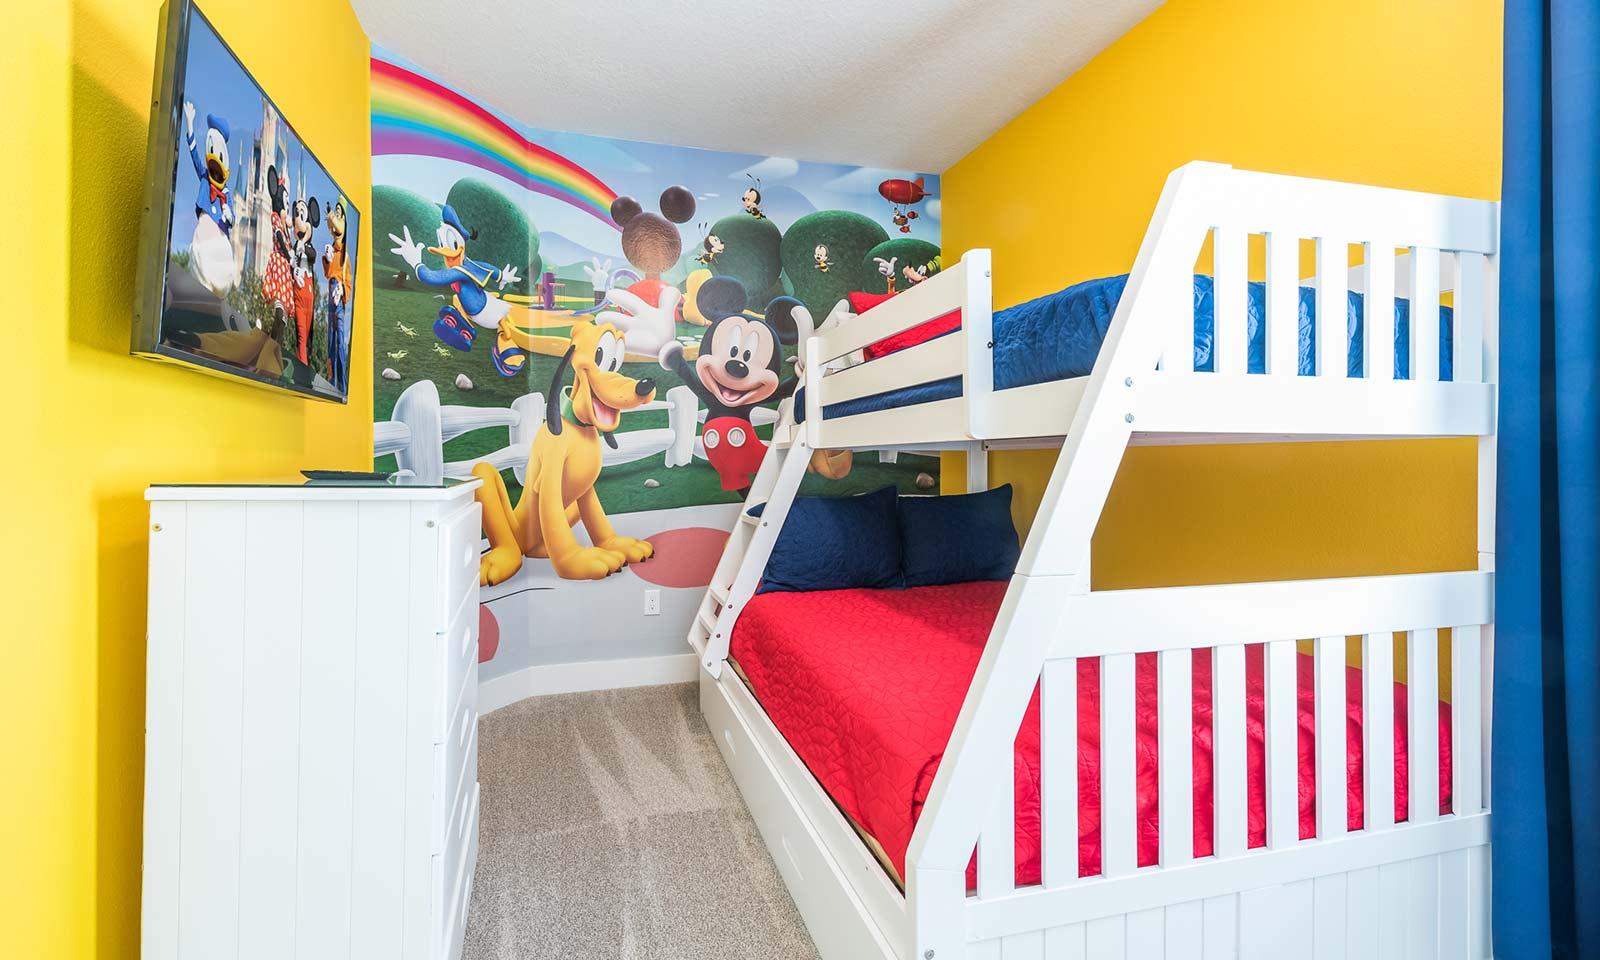 [amenities:Themed-Bedroom:1] Themed Bedroom